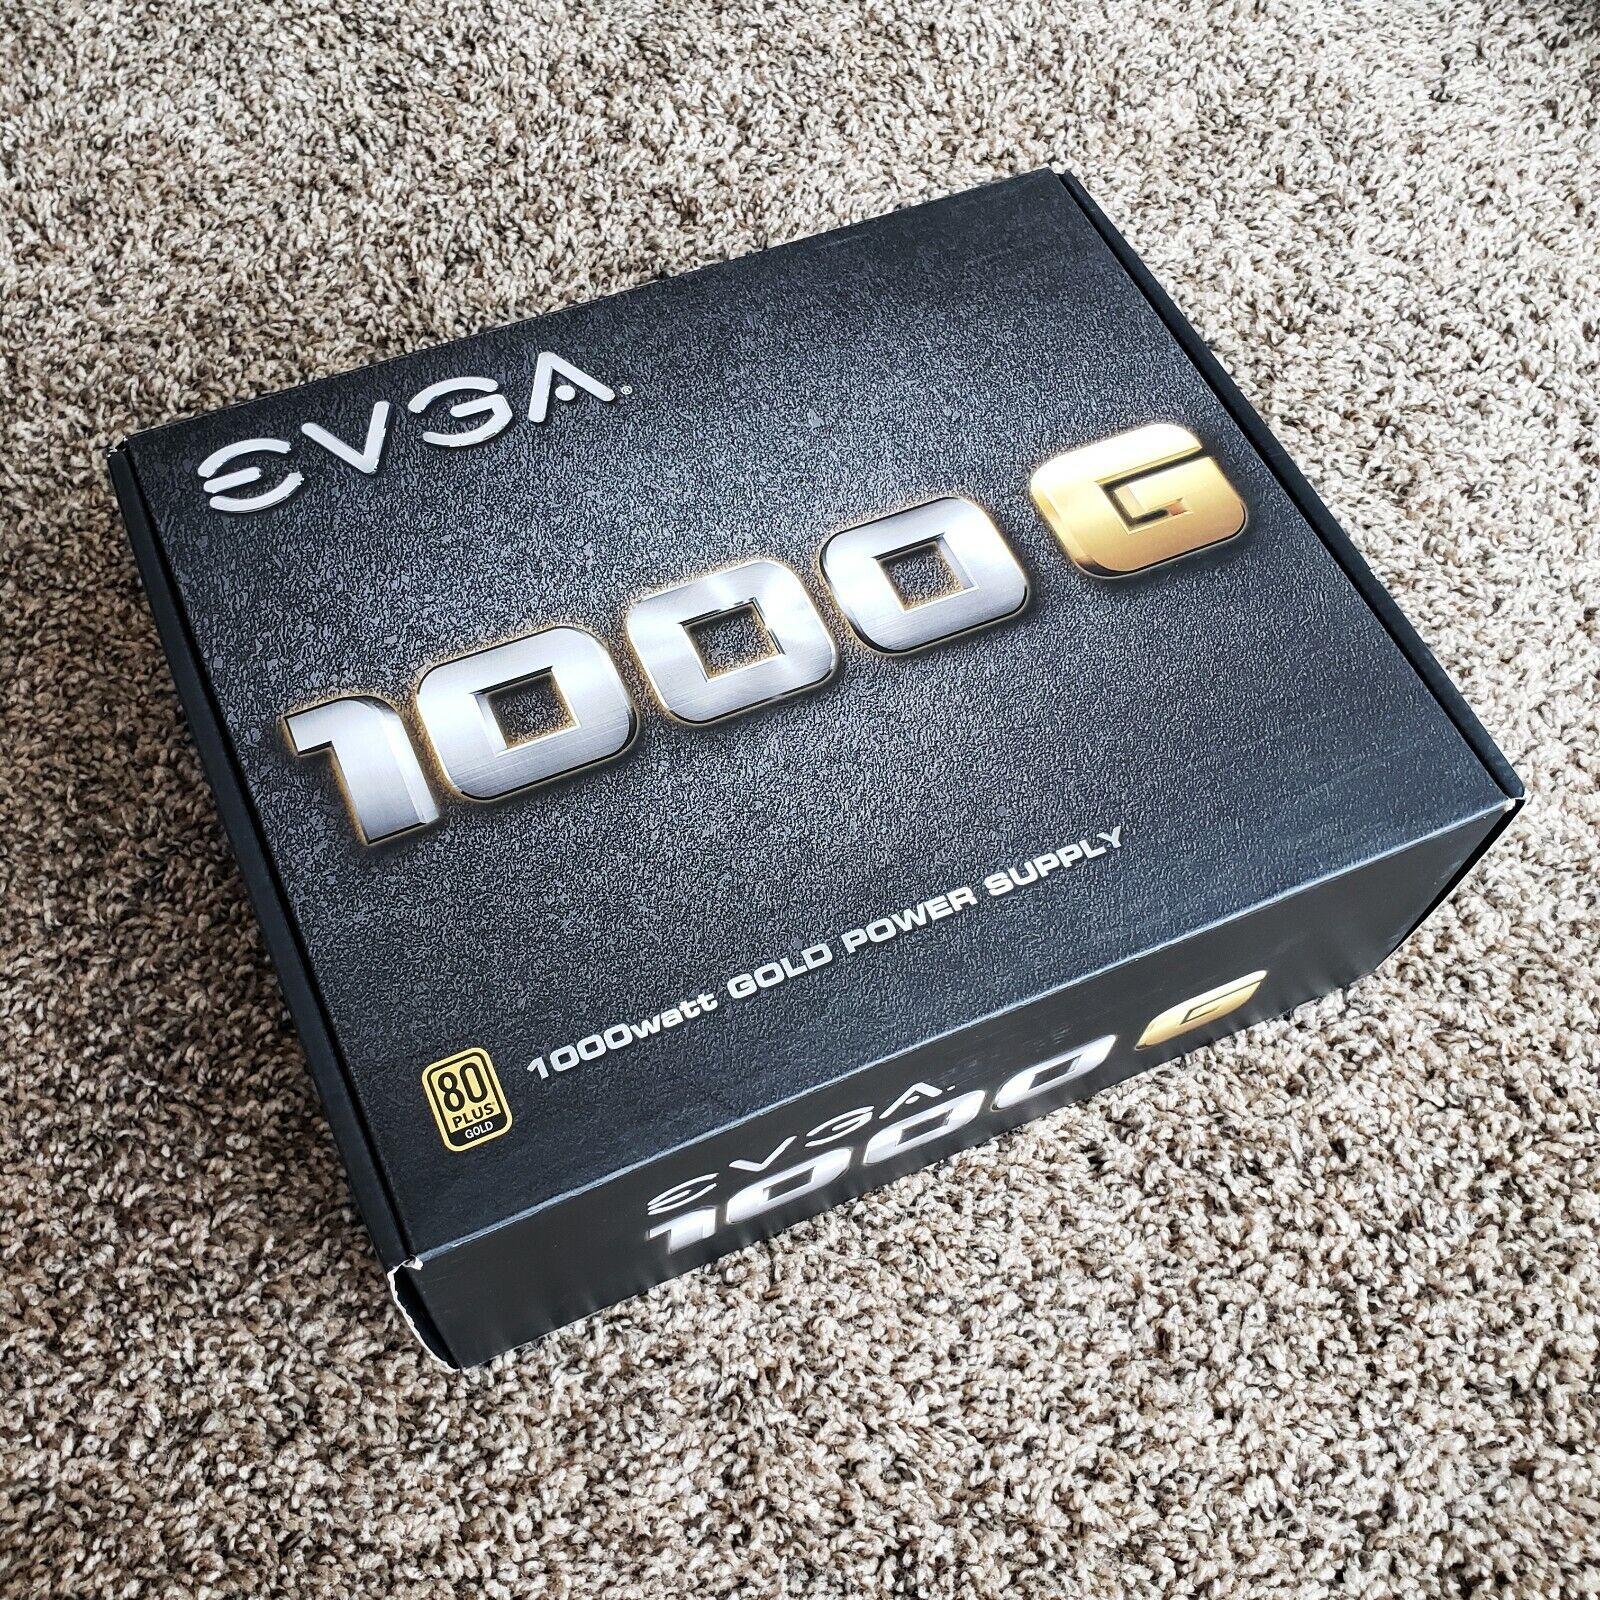 EVGA 1000G 1000W 80 GOLD Fully Modular Power Supply 120-G1-1000-VR - $119.00